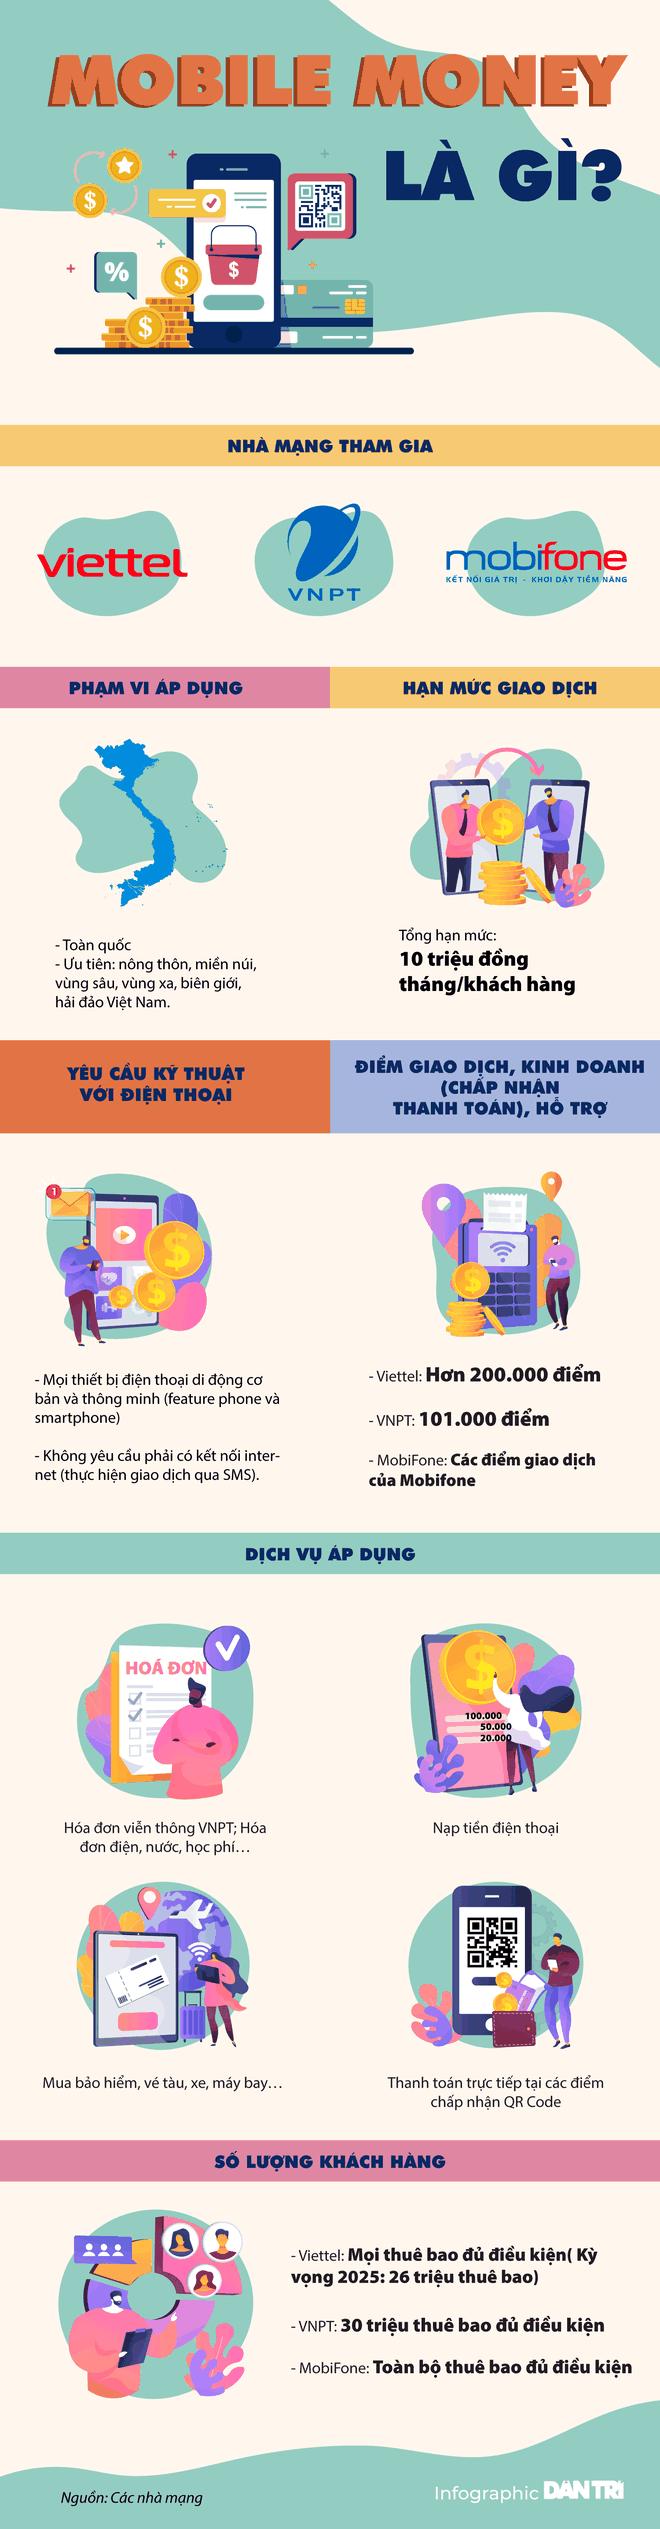 mobile-money-la-gi-1634022814884.png